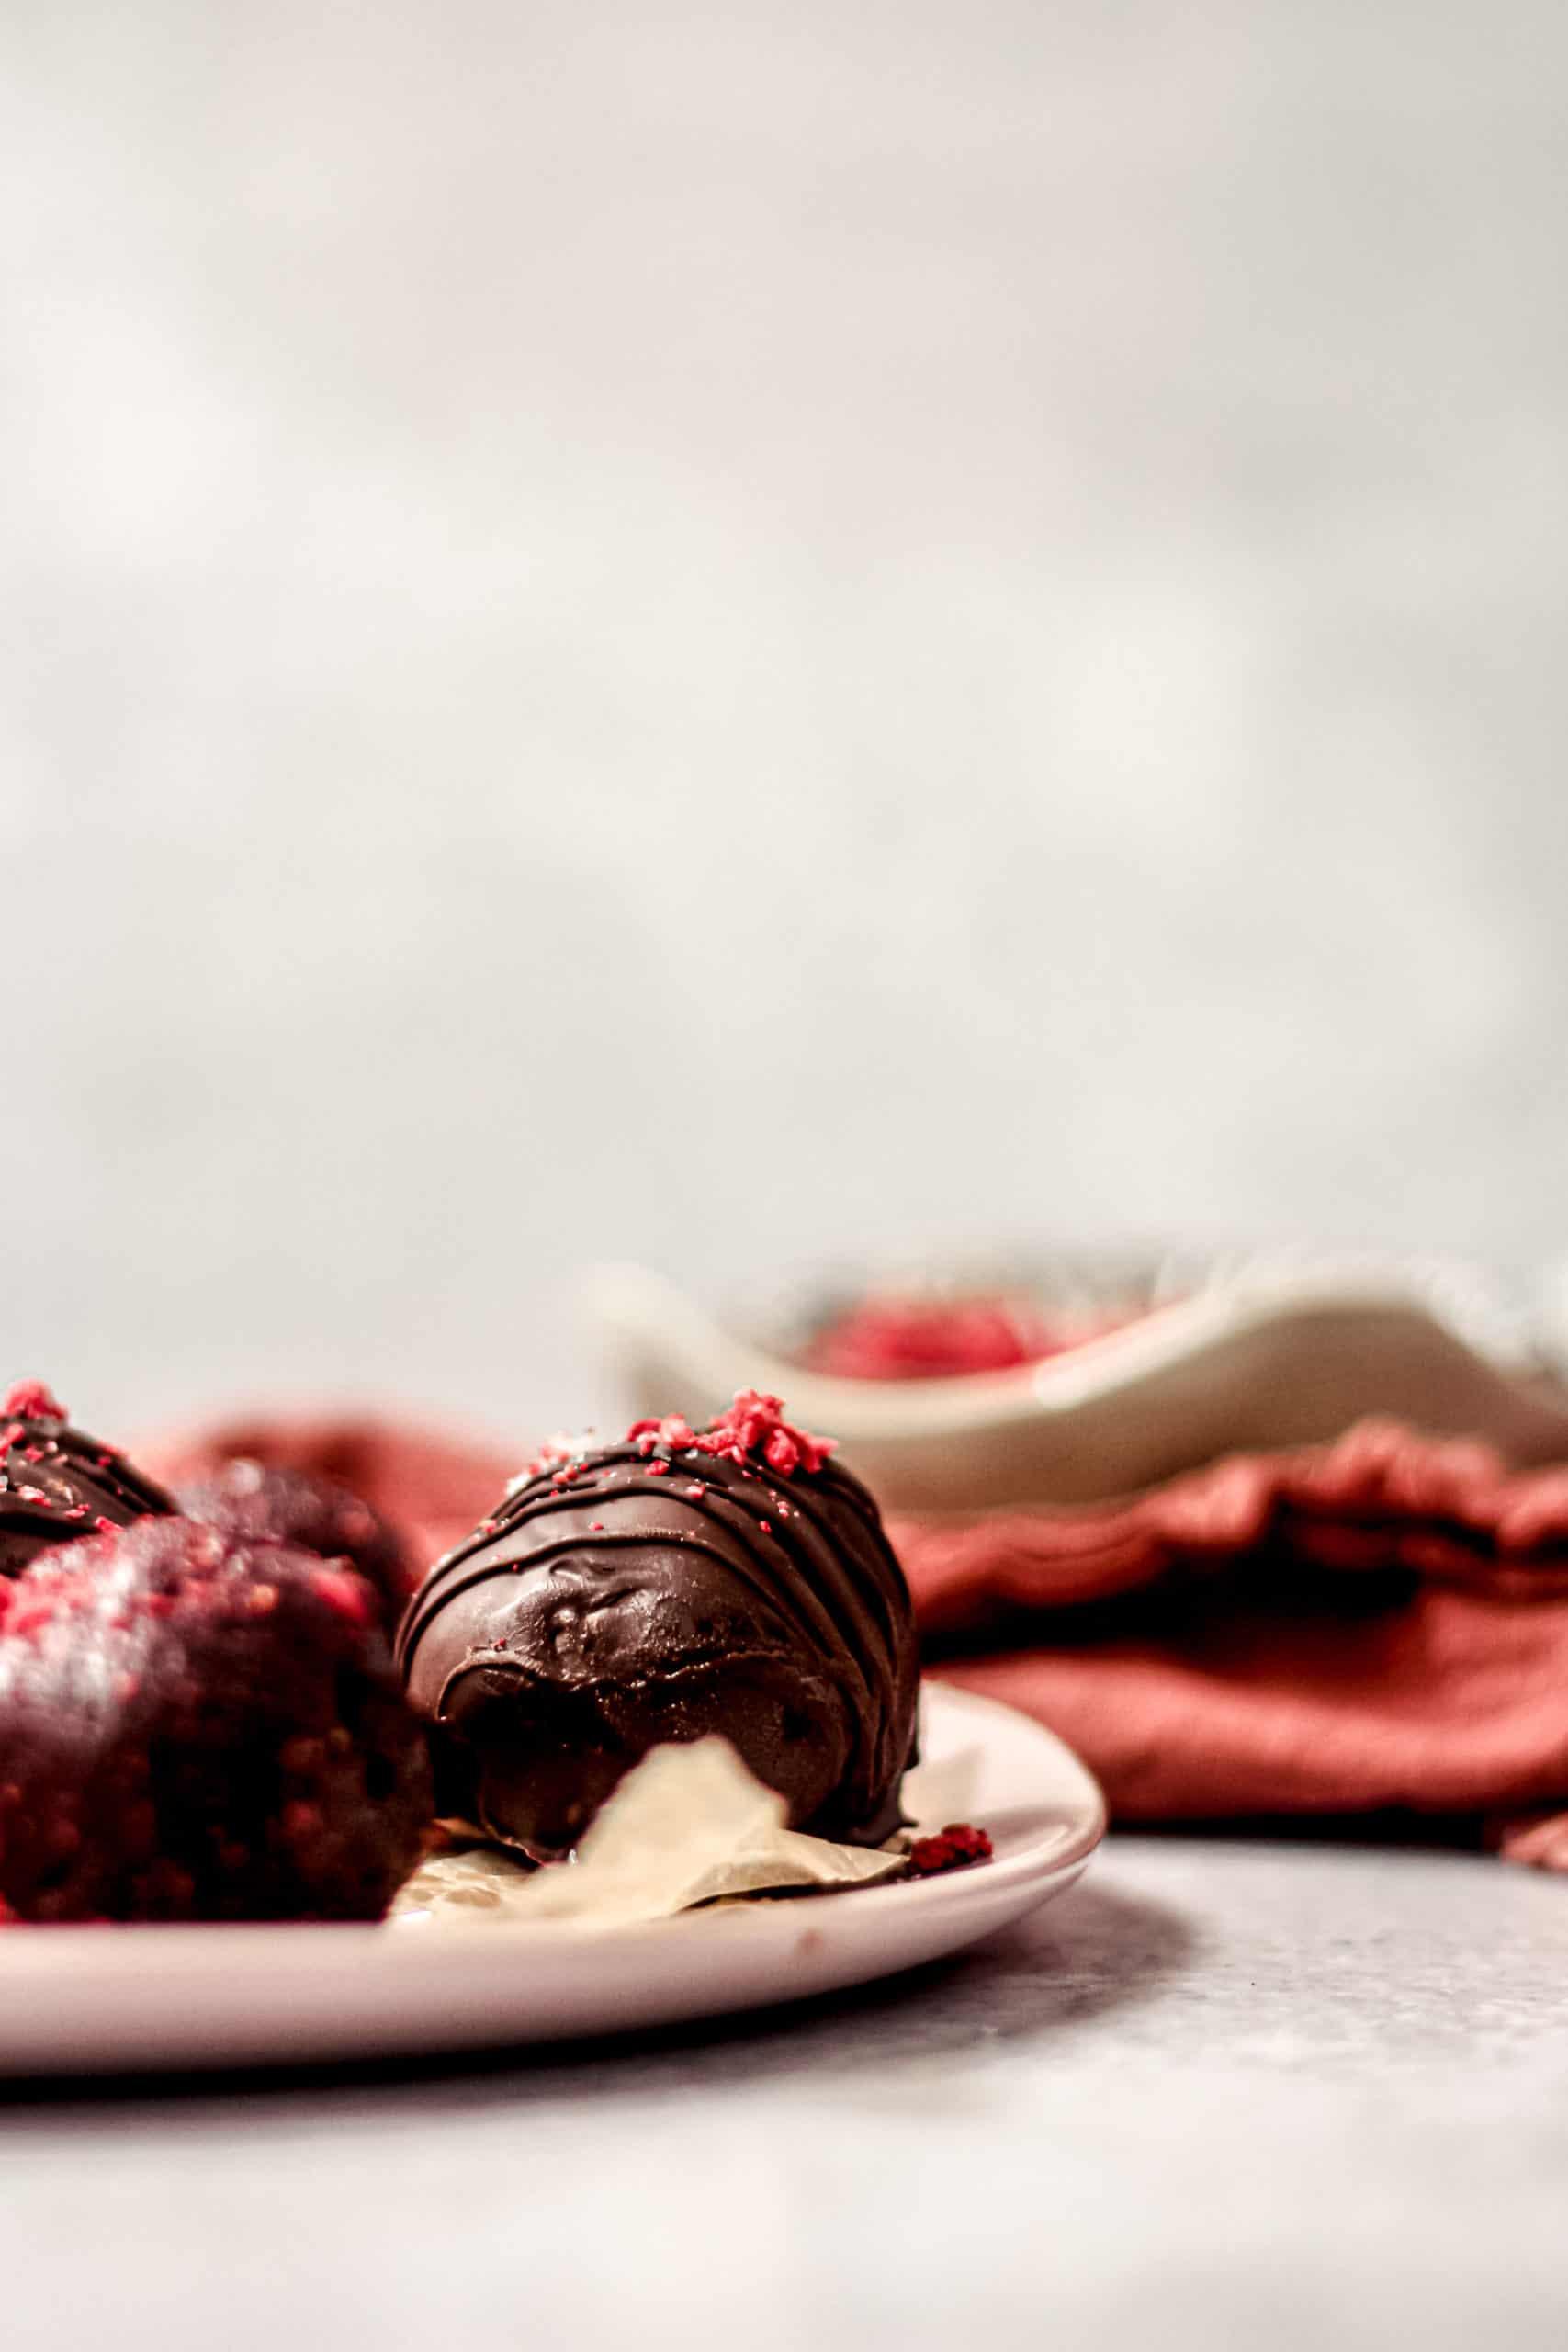 Strawberry Chocolate Cashew Butter Truffles